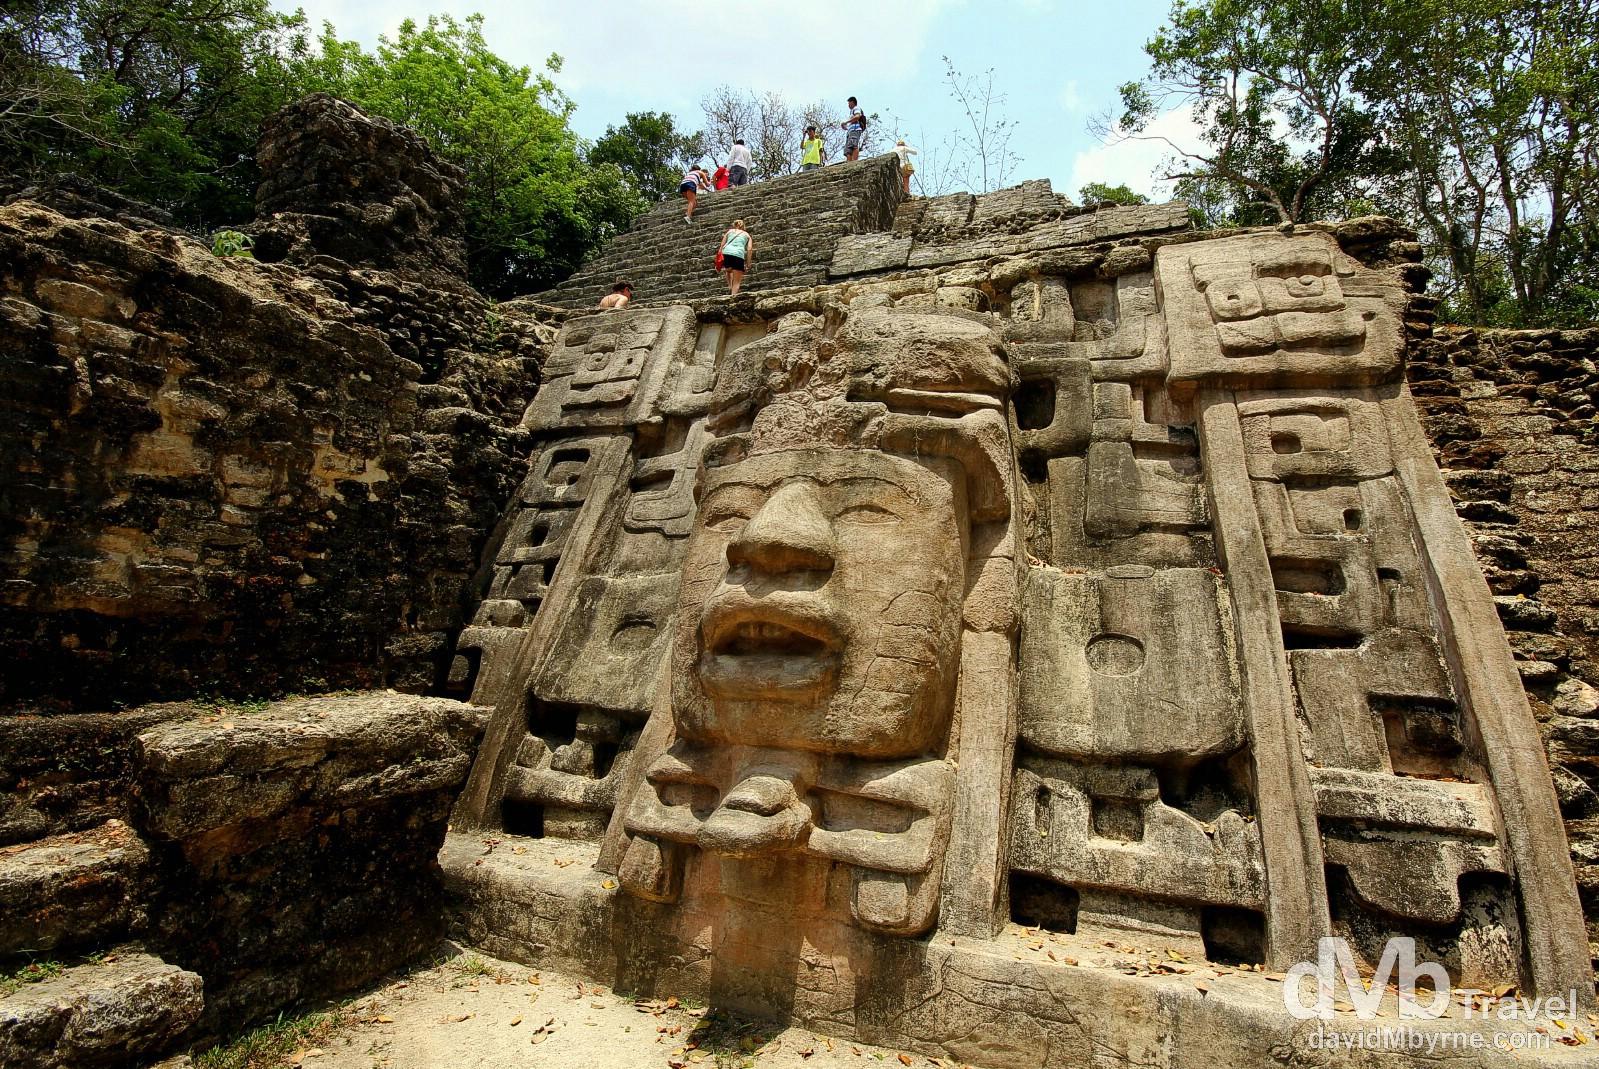 Scaling the aptly named Mask Temple at the Lamanai Mayan ruins, Central Belize. May 11th 2013.